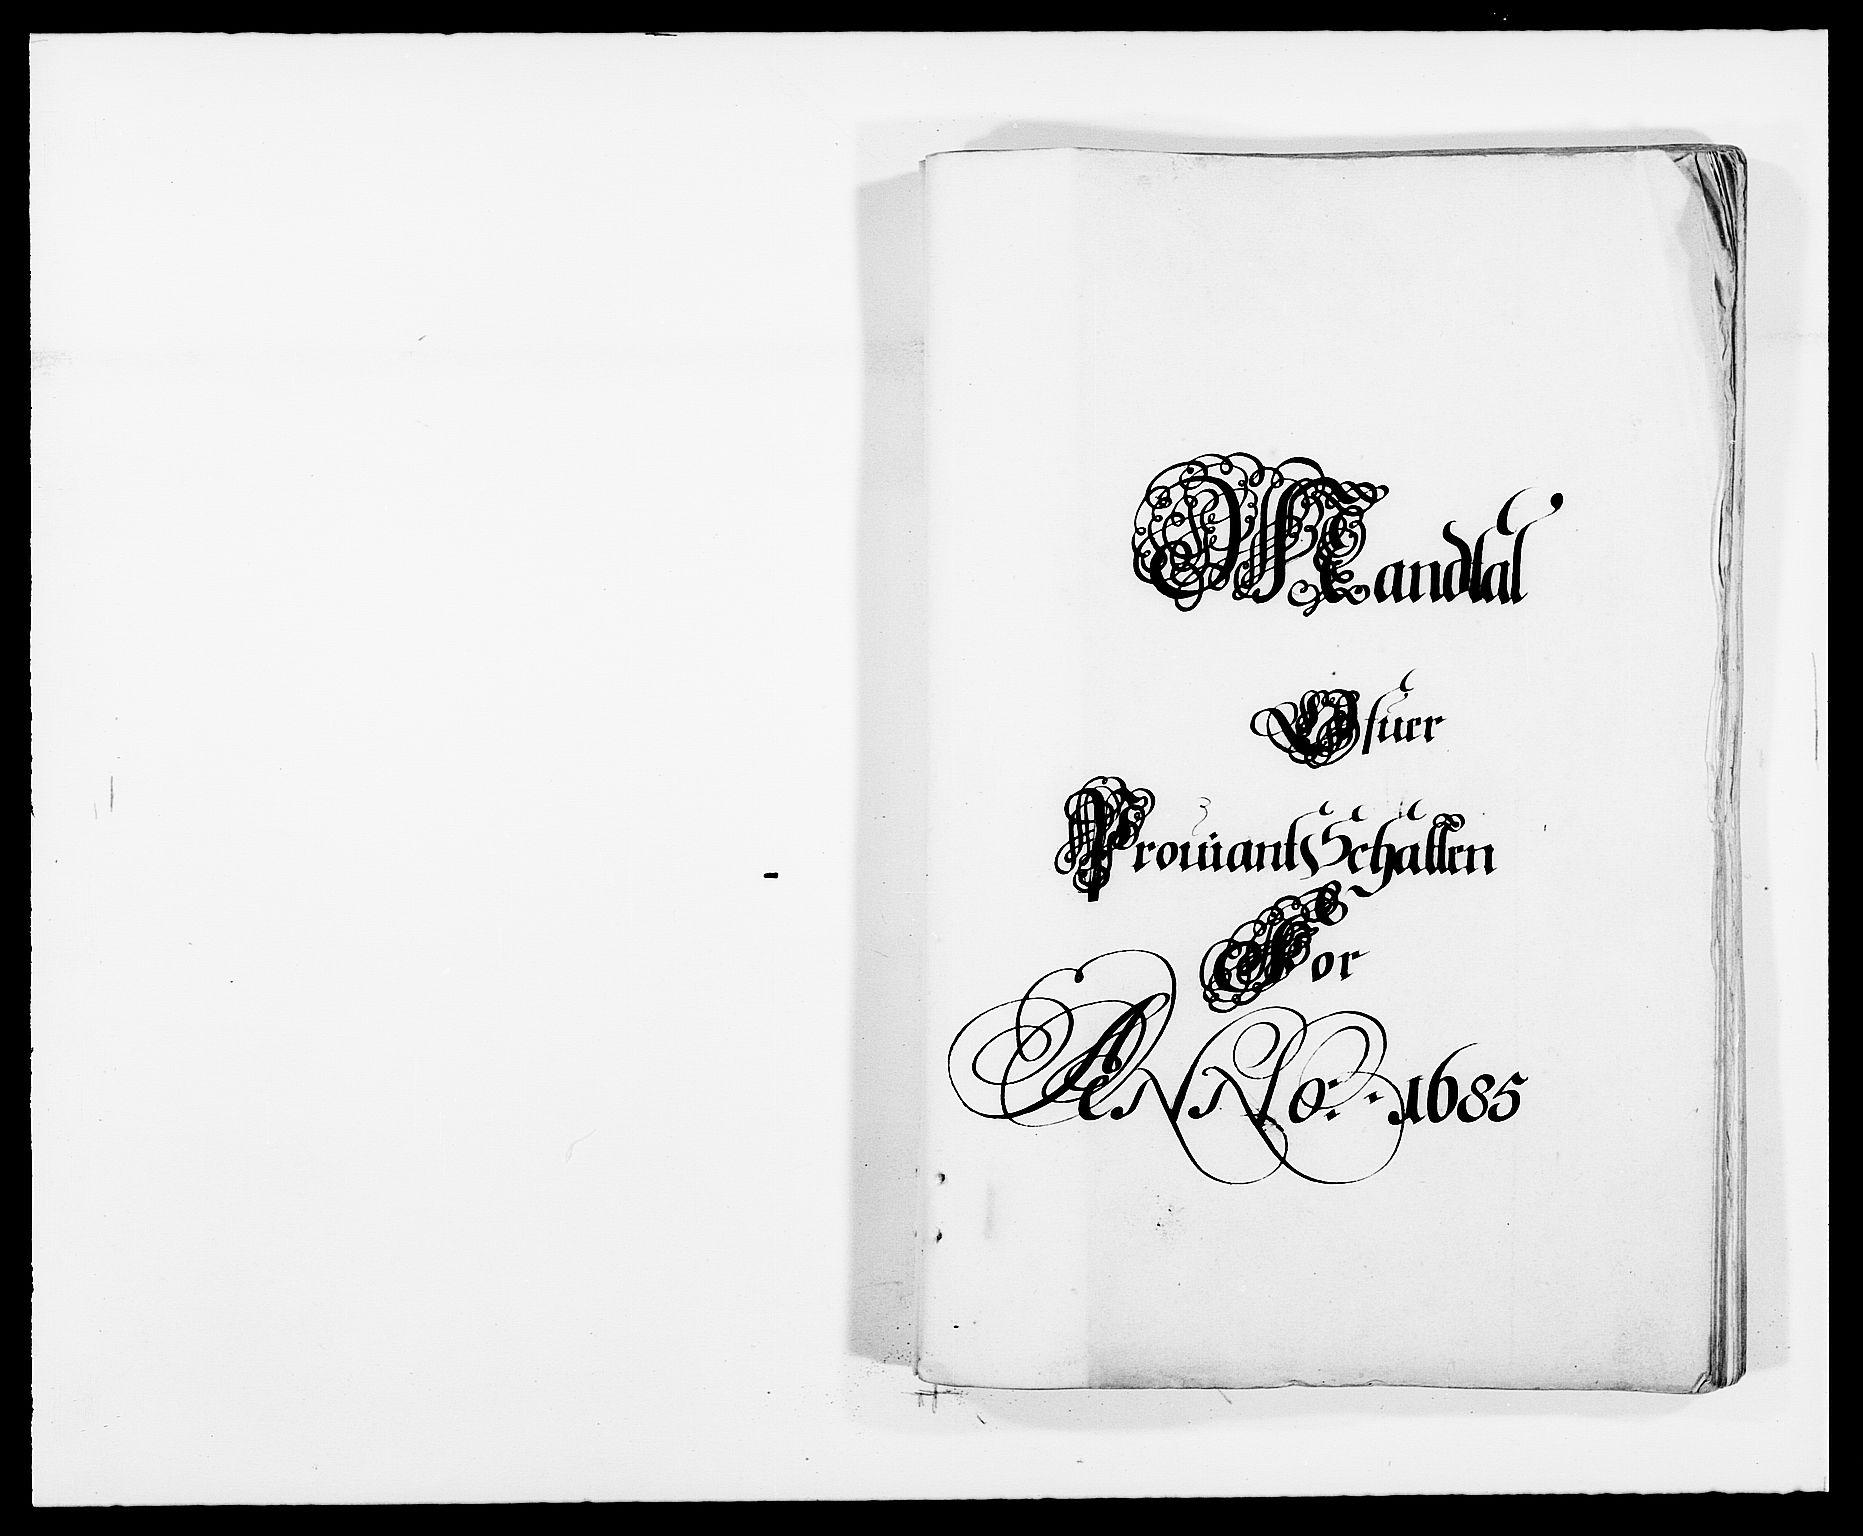 RA, Rentekammeret inntil 1814, Reviderte regnskaper, Fogderegnskap, R32/L1856: Fogderegnskap Jarlsberg grevskap, 1685, s. 90